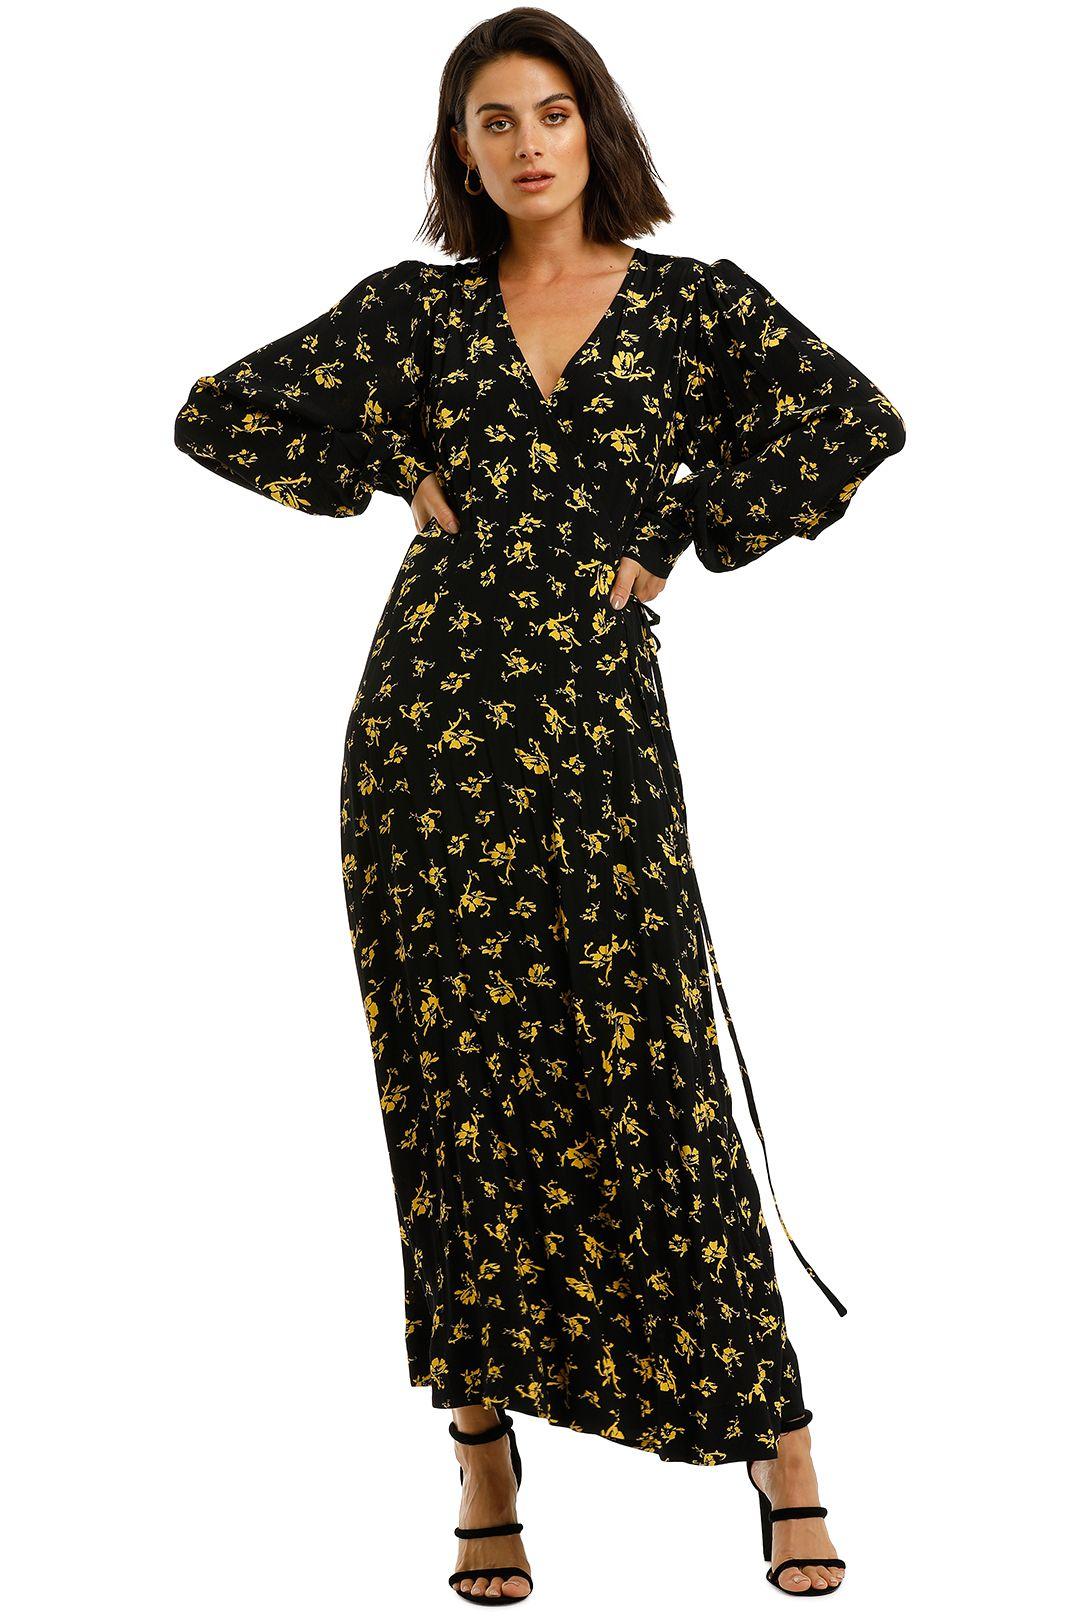 Ganni-Printed-Crepe-LS-Long-Dress-Black-Yellow-Front